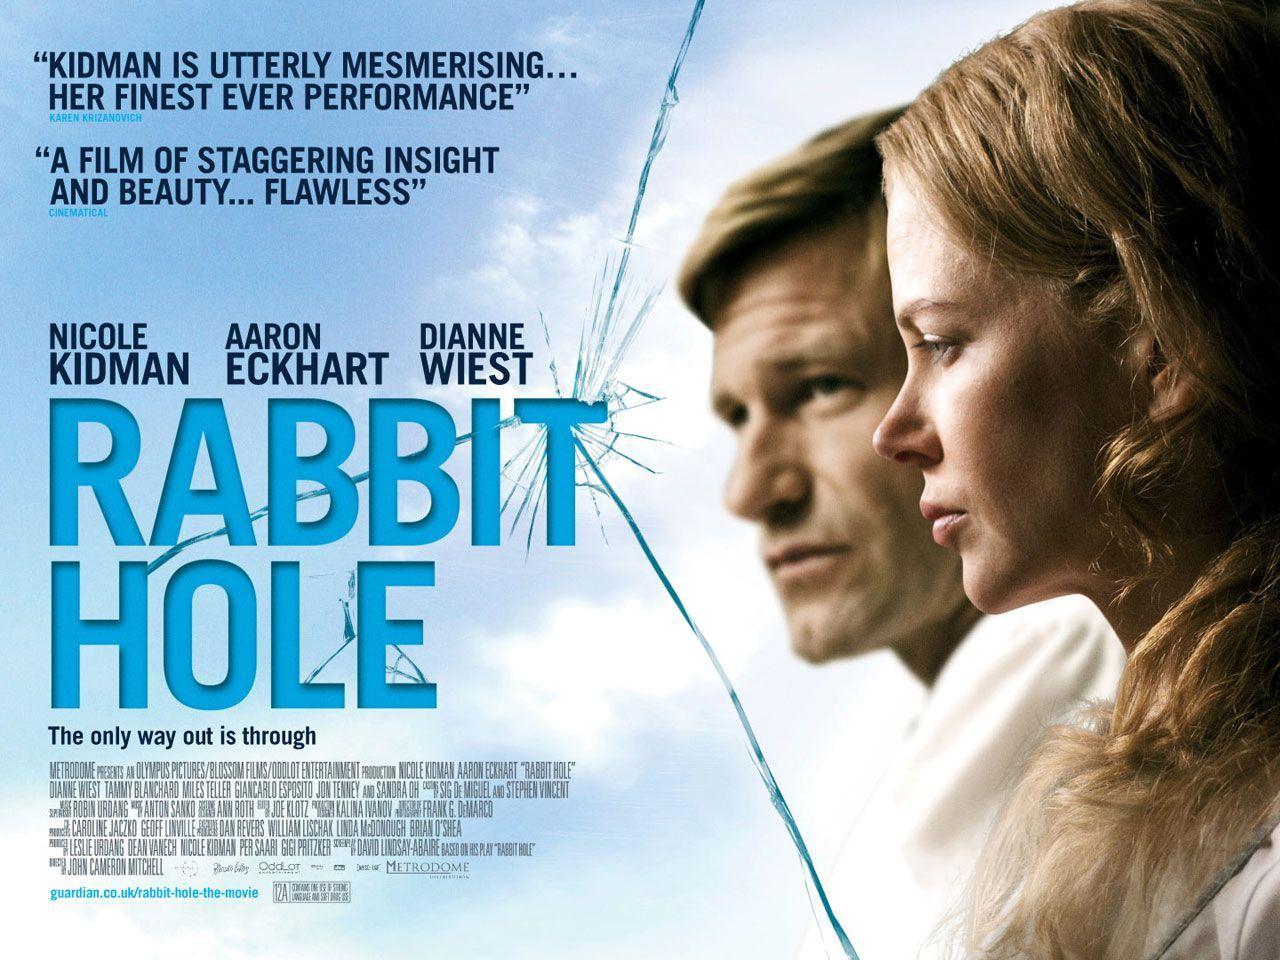 http://3.bp.blogspot.com/_5yoH7bxgL0w/TRkzux4AaRI/AAAAAAAANfE/_fs-BR_PpiA/s1600/rabbit-hole-uk-movie-poster.jpg